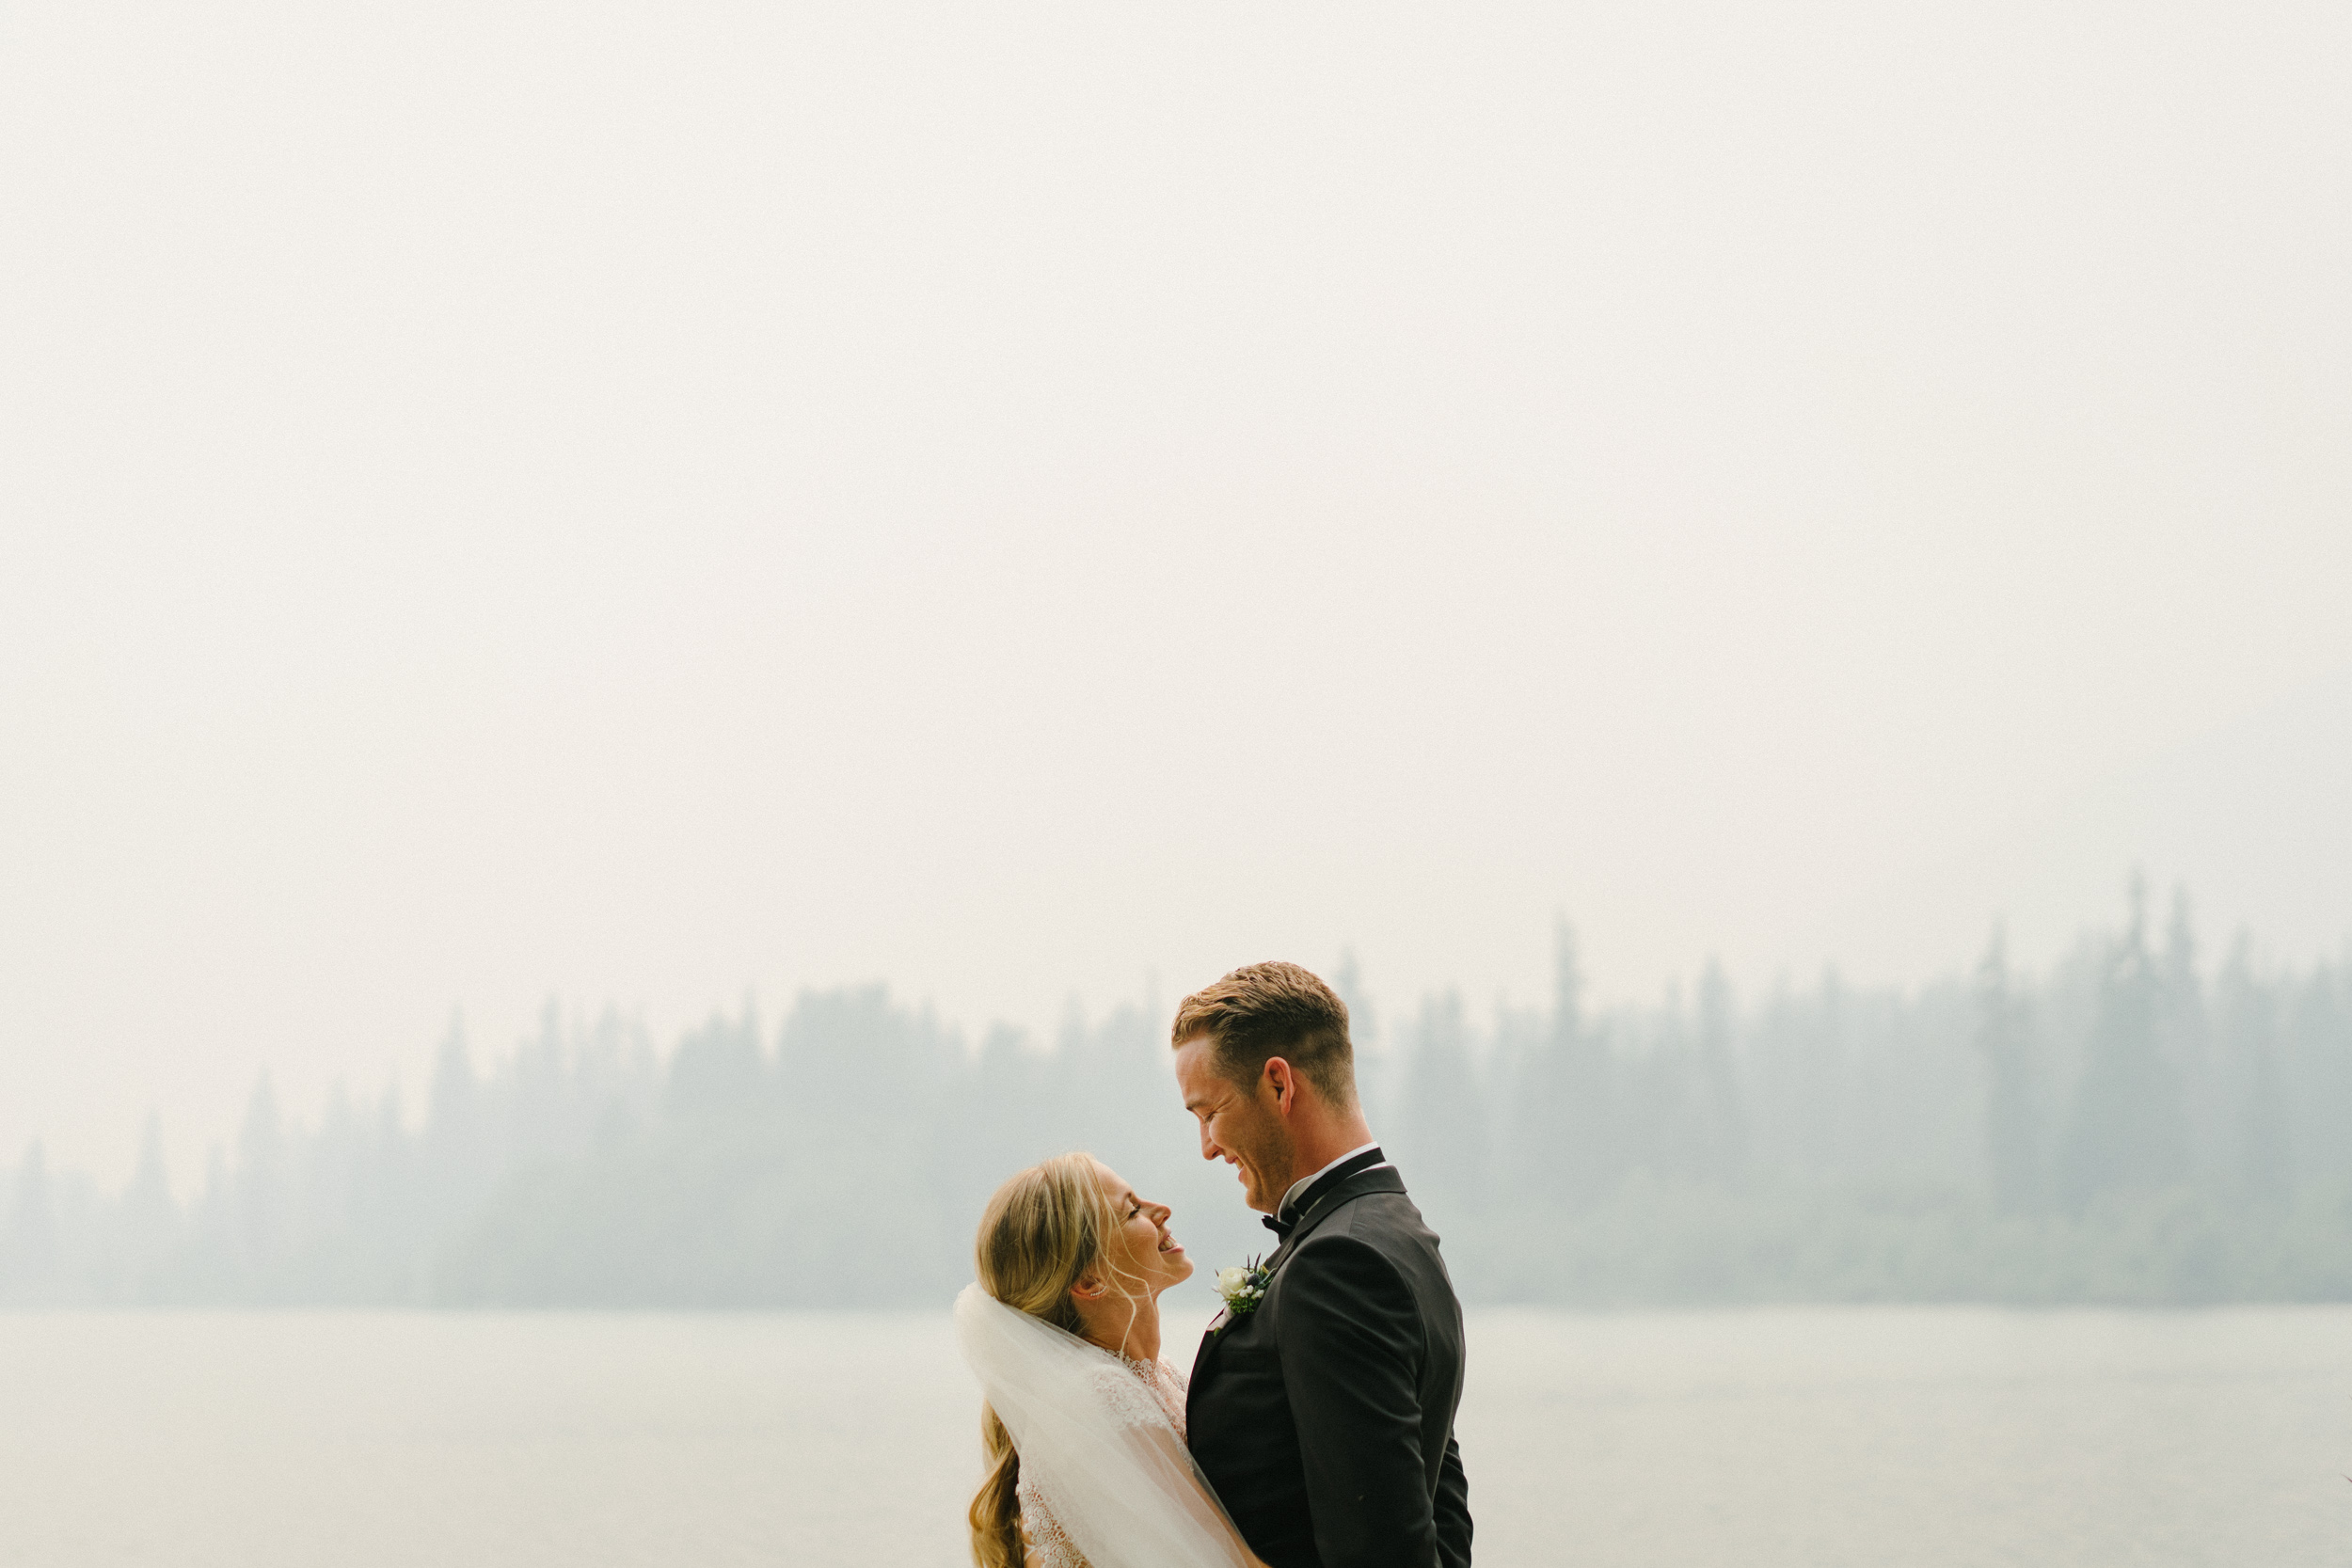 dating με βέλιοριστοσελίδες γνωριμιών για ανύπαντρες νοσοκόμες